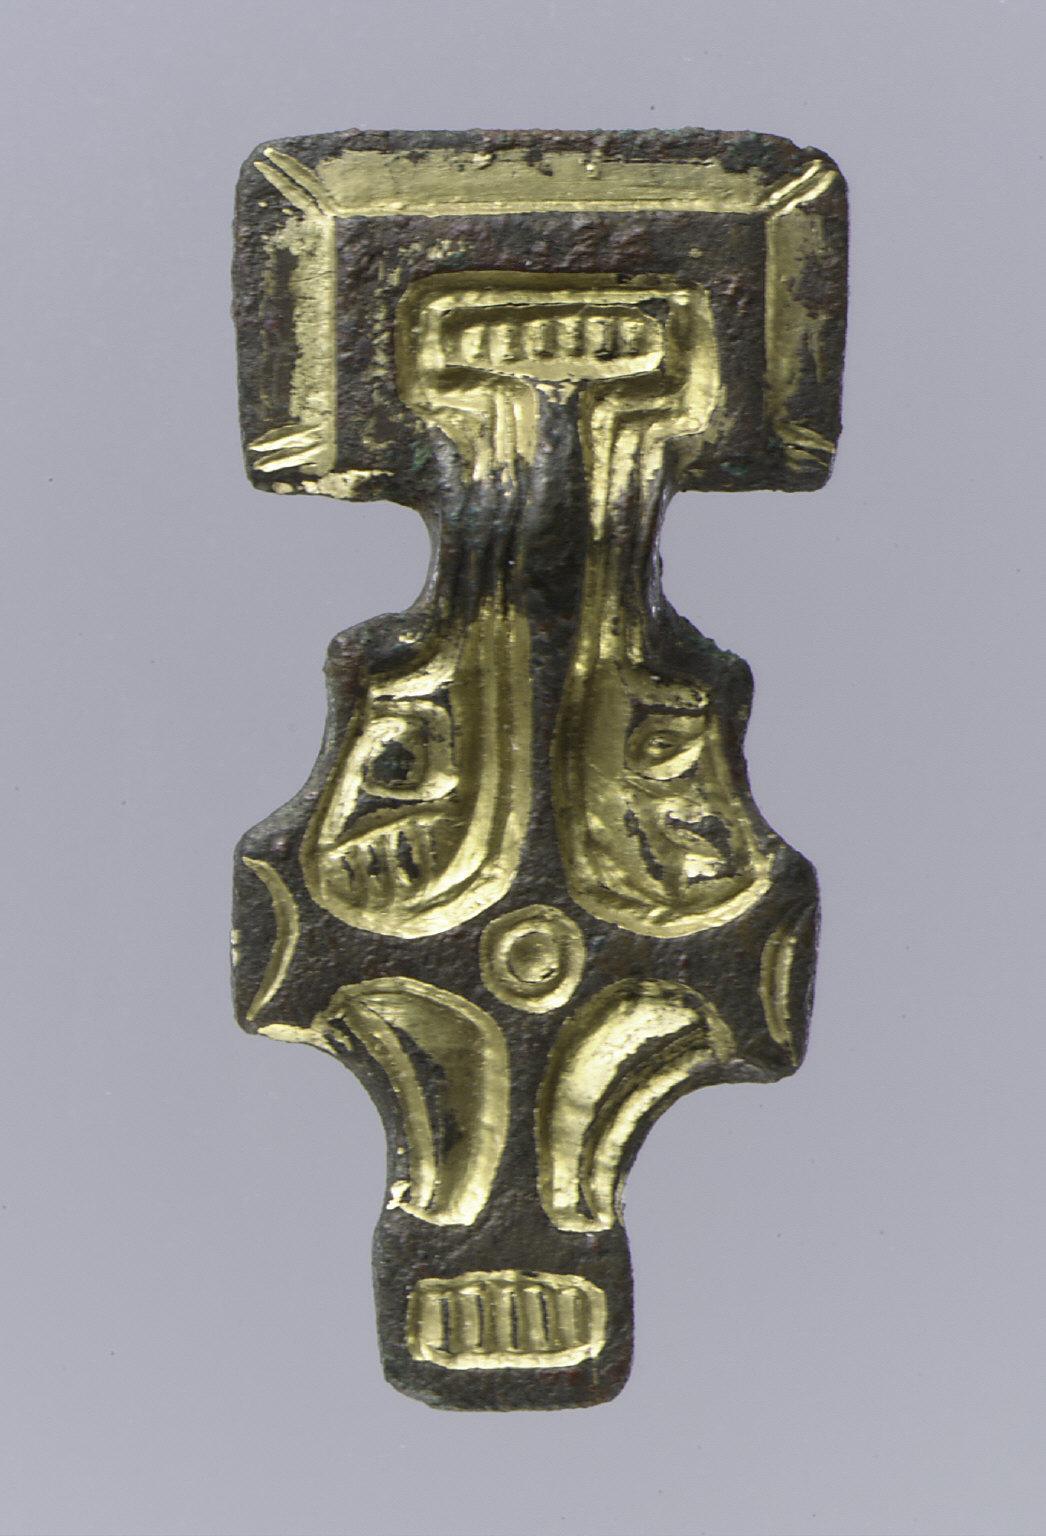 Miniature Square-Headed Brooch